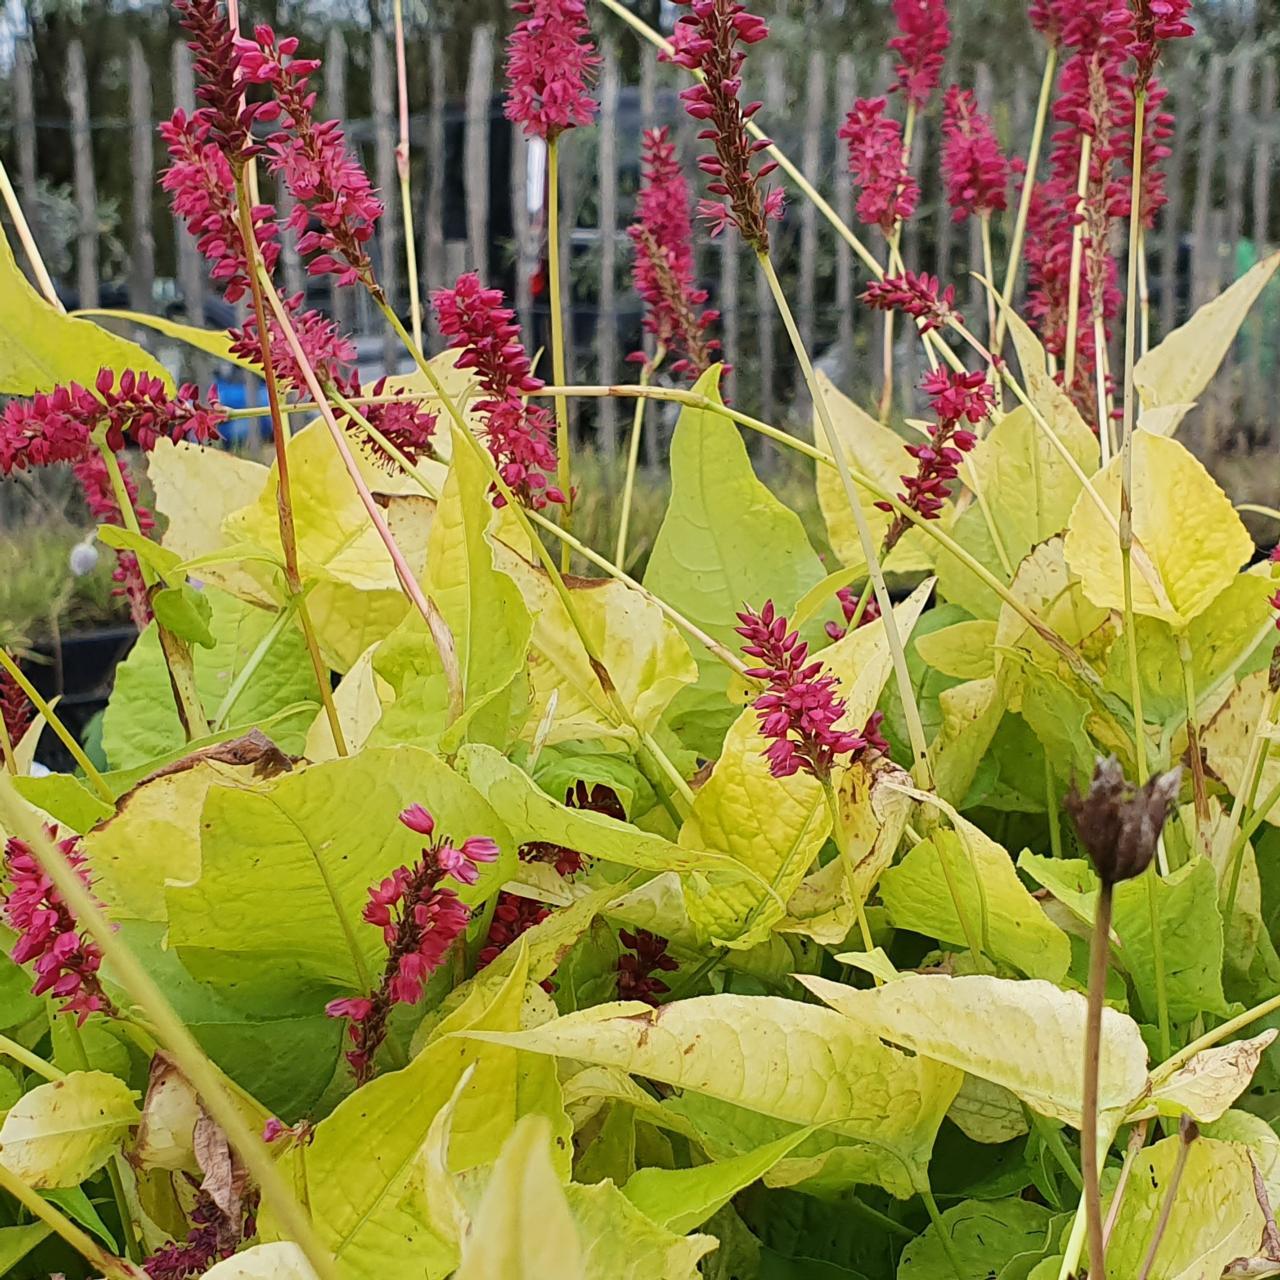 Persicaria amplexicaulis 'Golden Arrow' plant